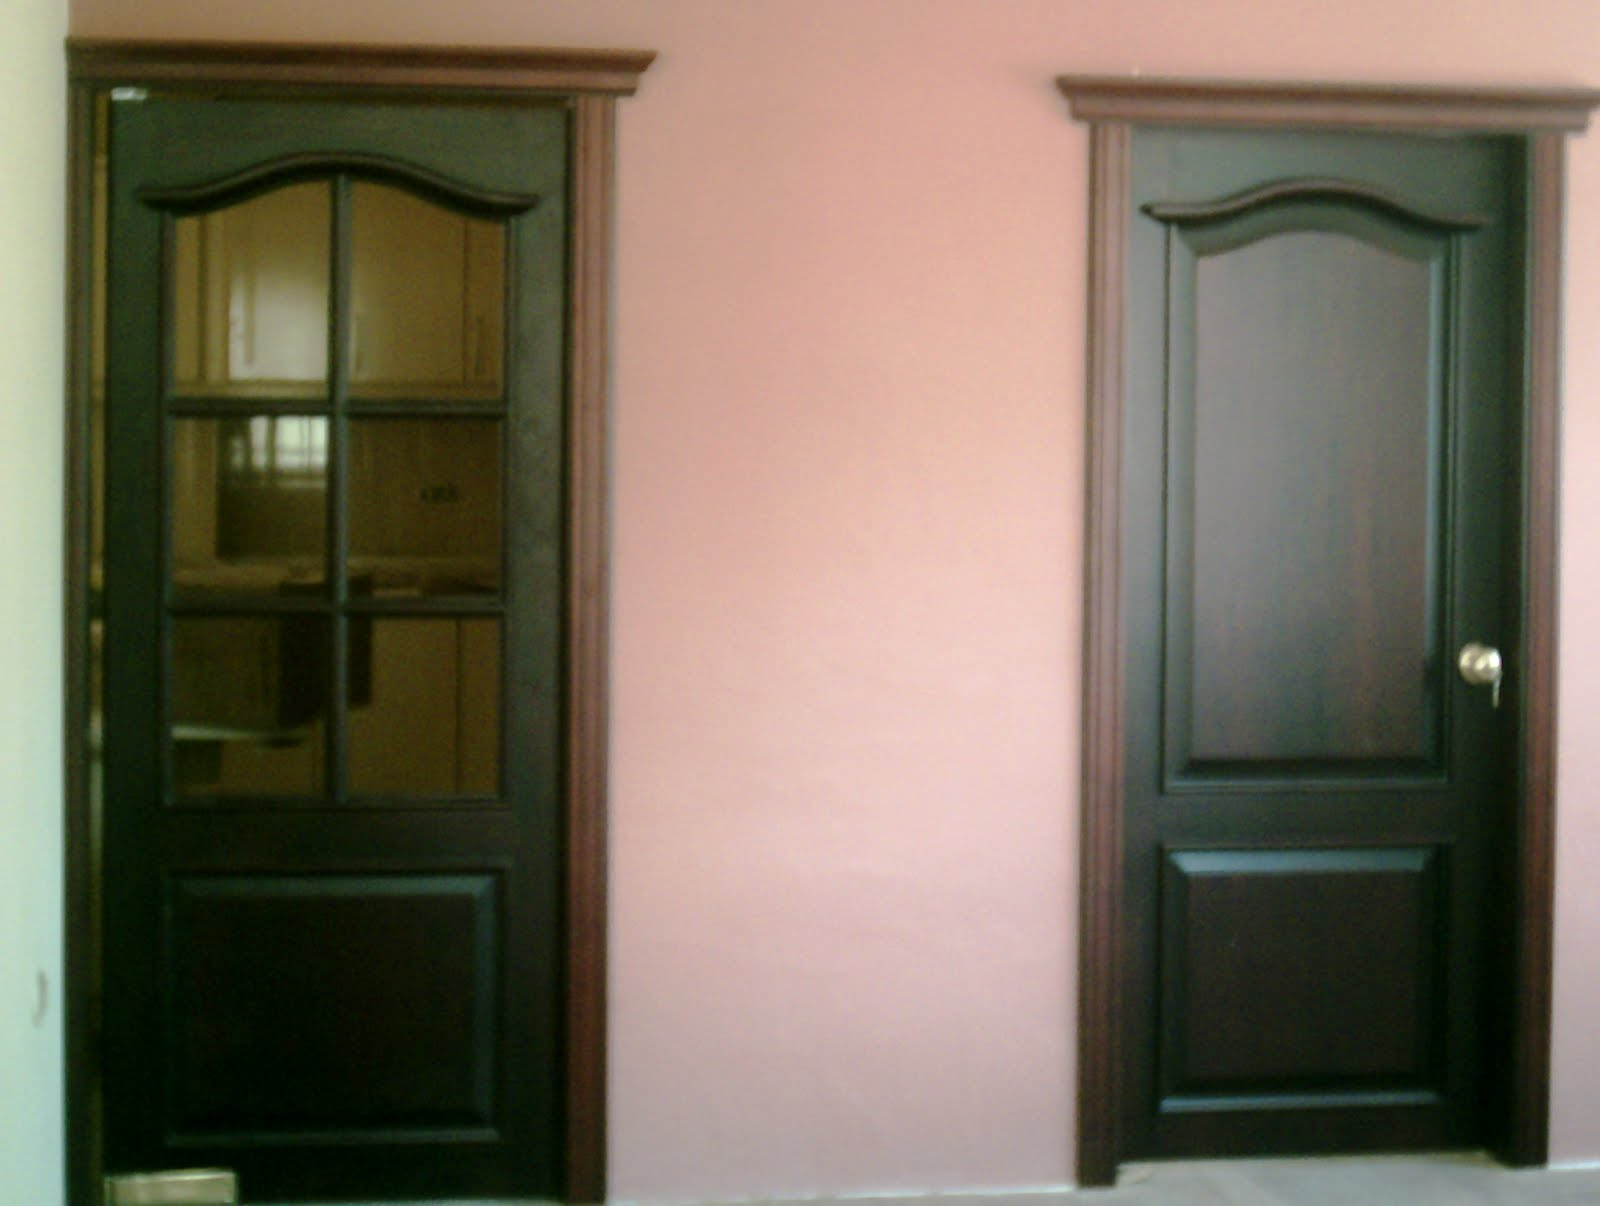 Ideatumobiliario puertas interiores y exteriores para su for Precio de puertas para interiores